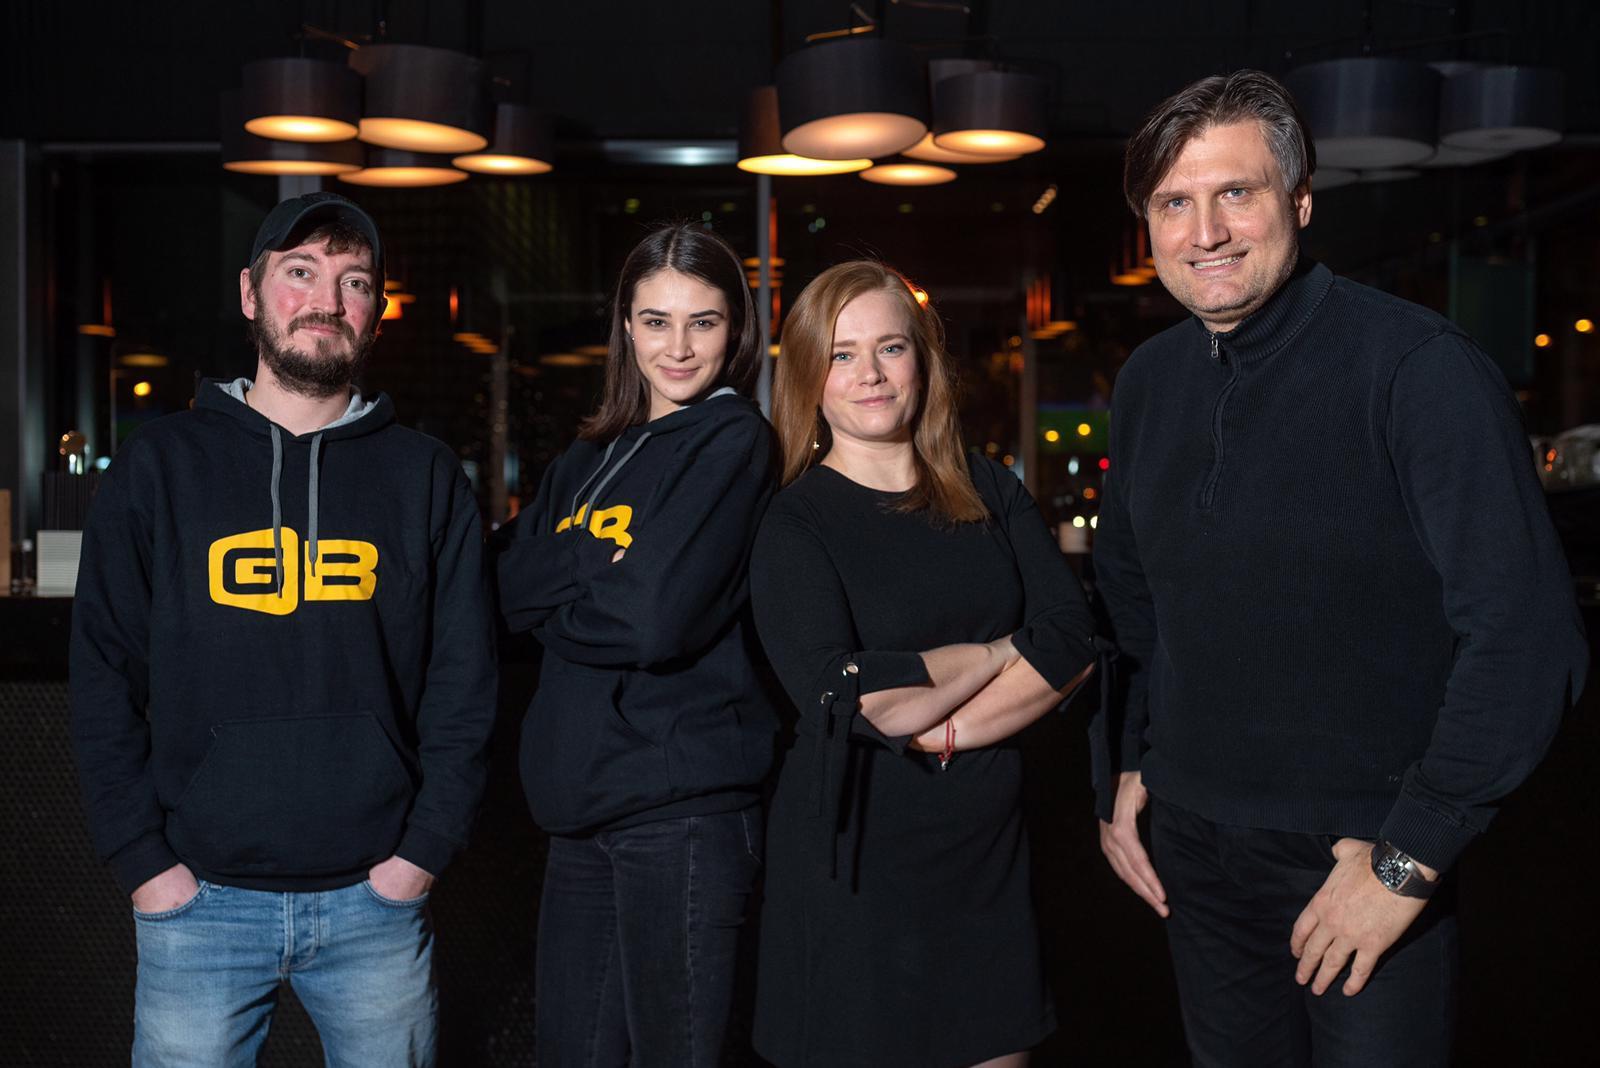 Lovro Lajoš, Paulina Cetina aka Amey, Dunja Trojan, Saša Cvetojević